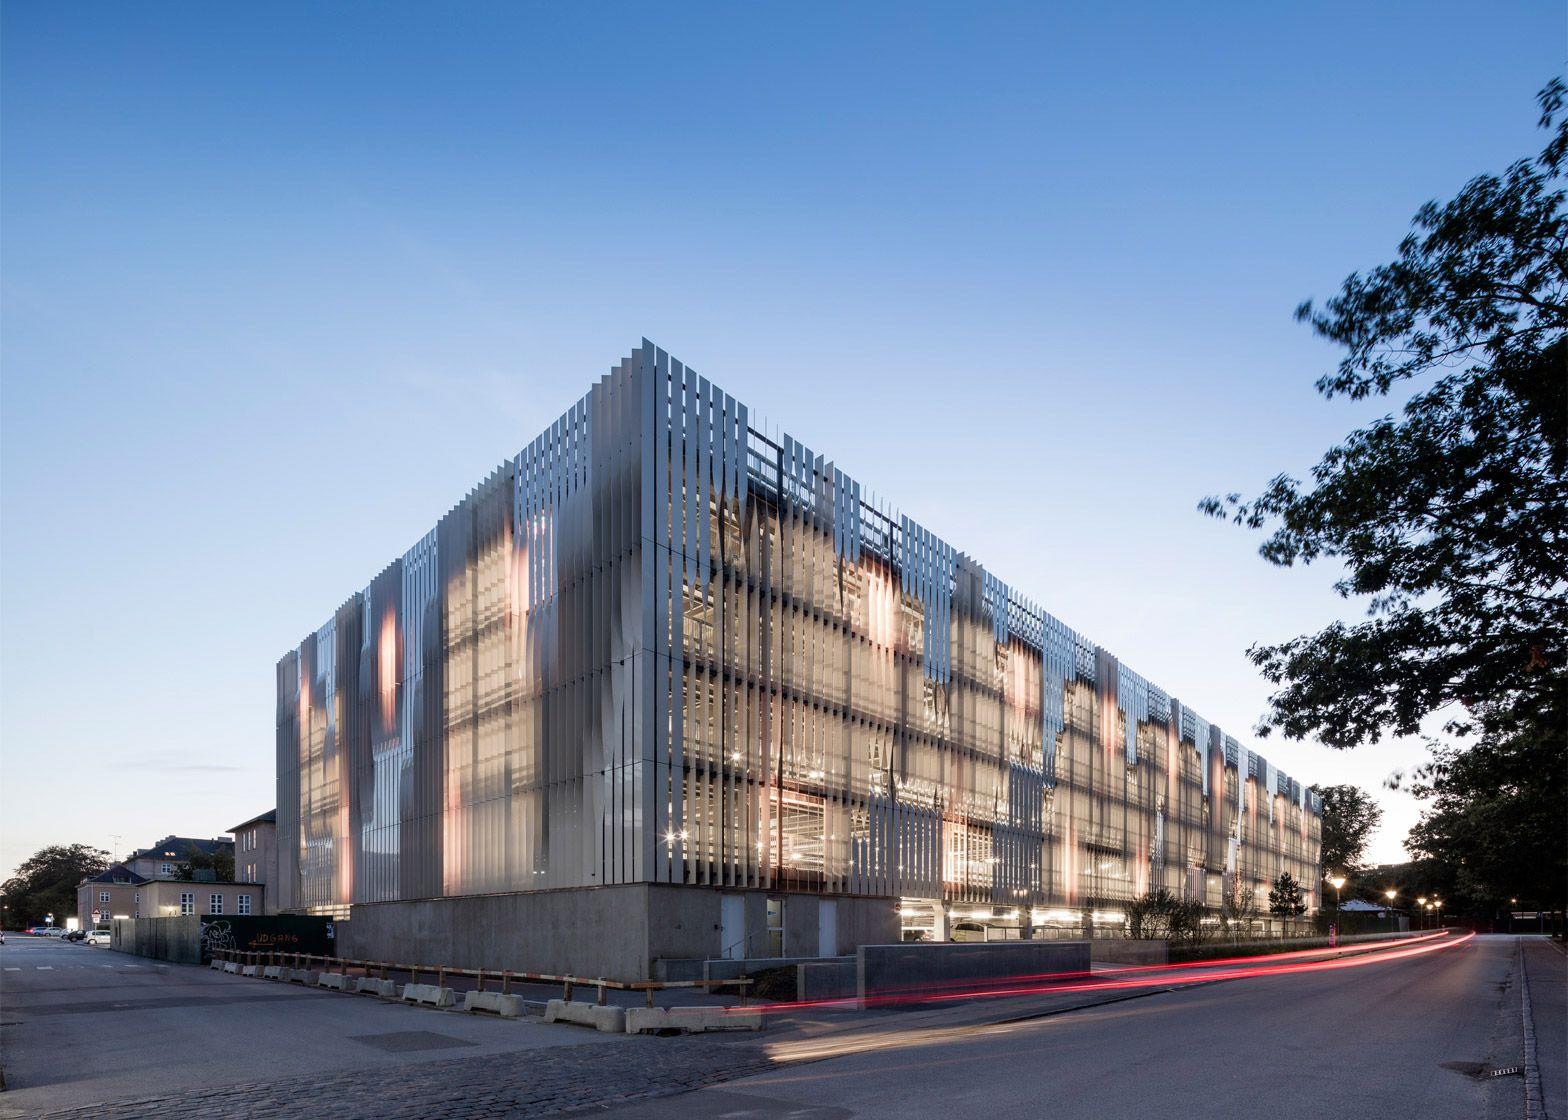 3xn Completes Copenhagen Hospital Building With Slanted